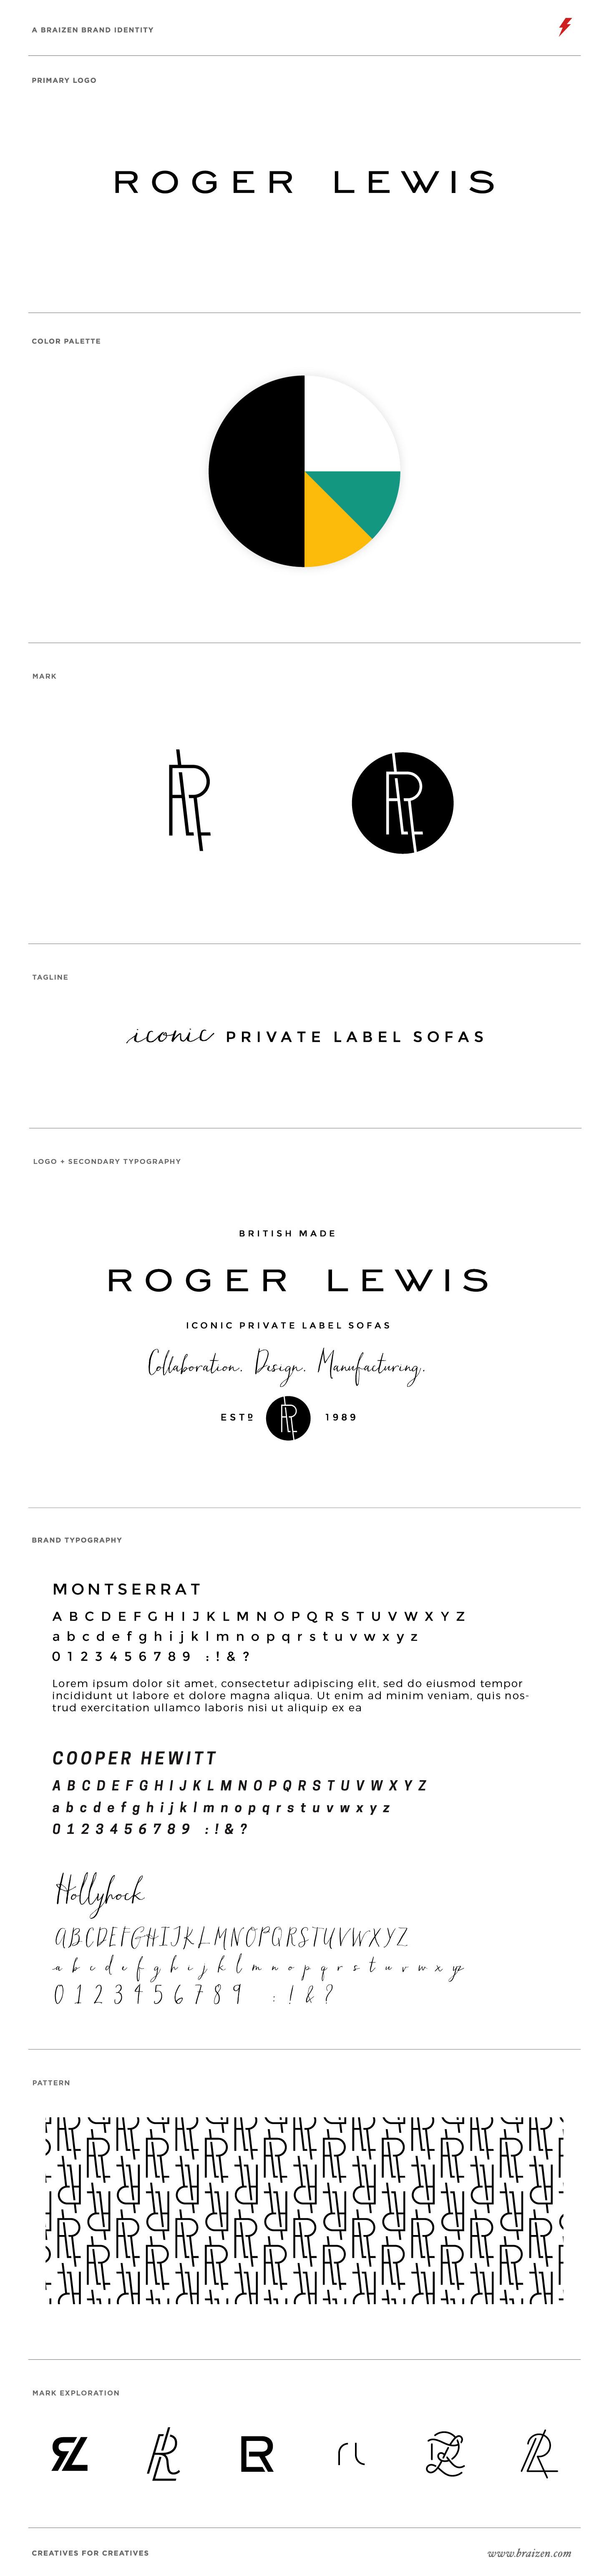 Roger Lewis Brand Identity by Braizen